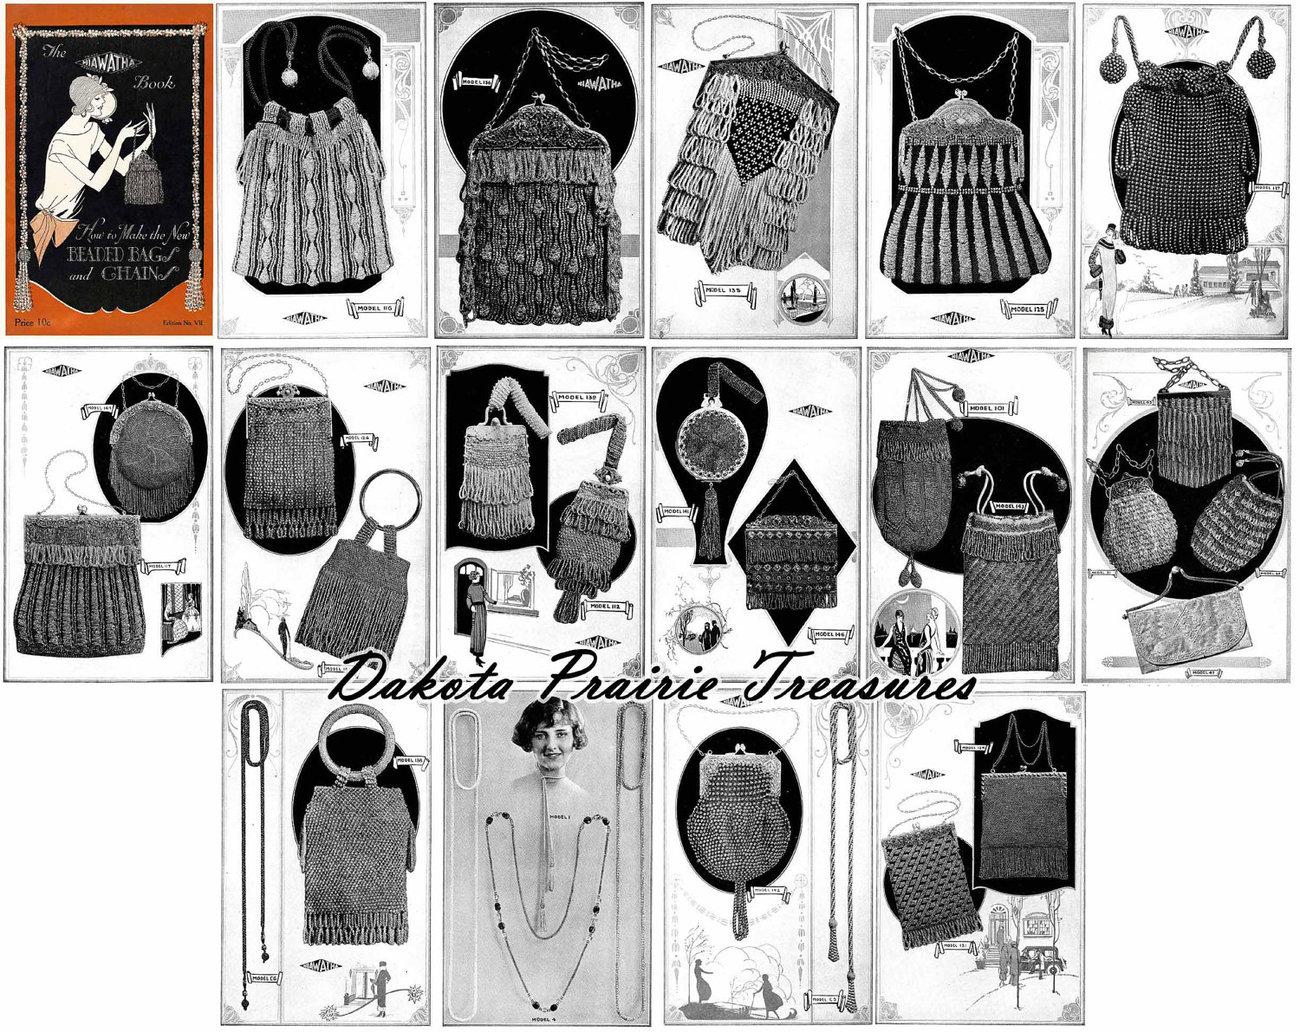 Flapper Era Book Beaded Purses Handbags Knit Crochet Patterns 1924